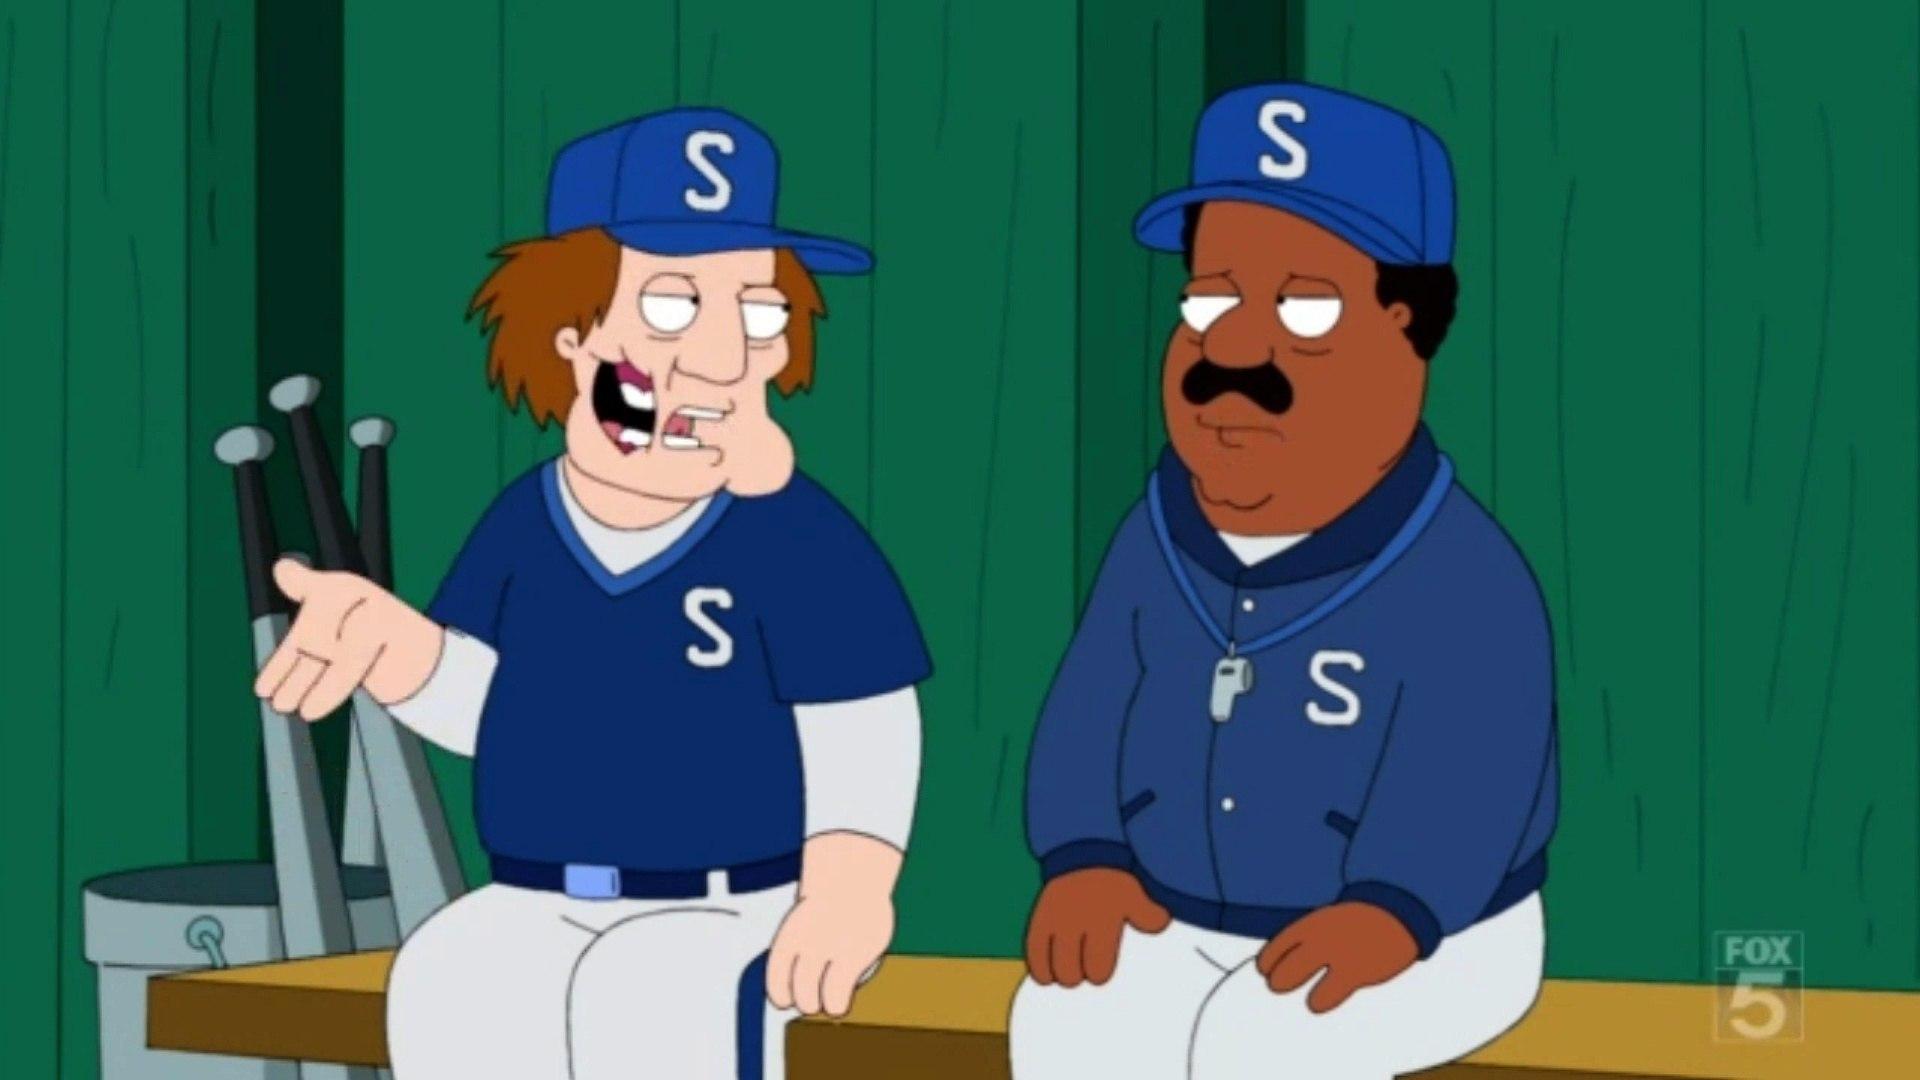 The Cleveland Show S01E10 Clip#5.